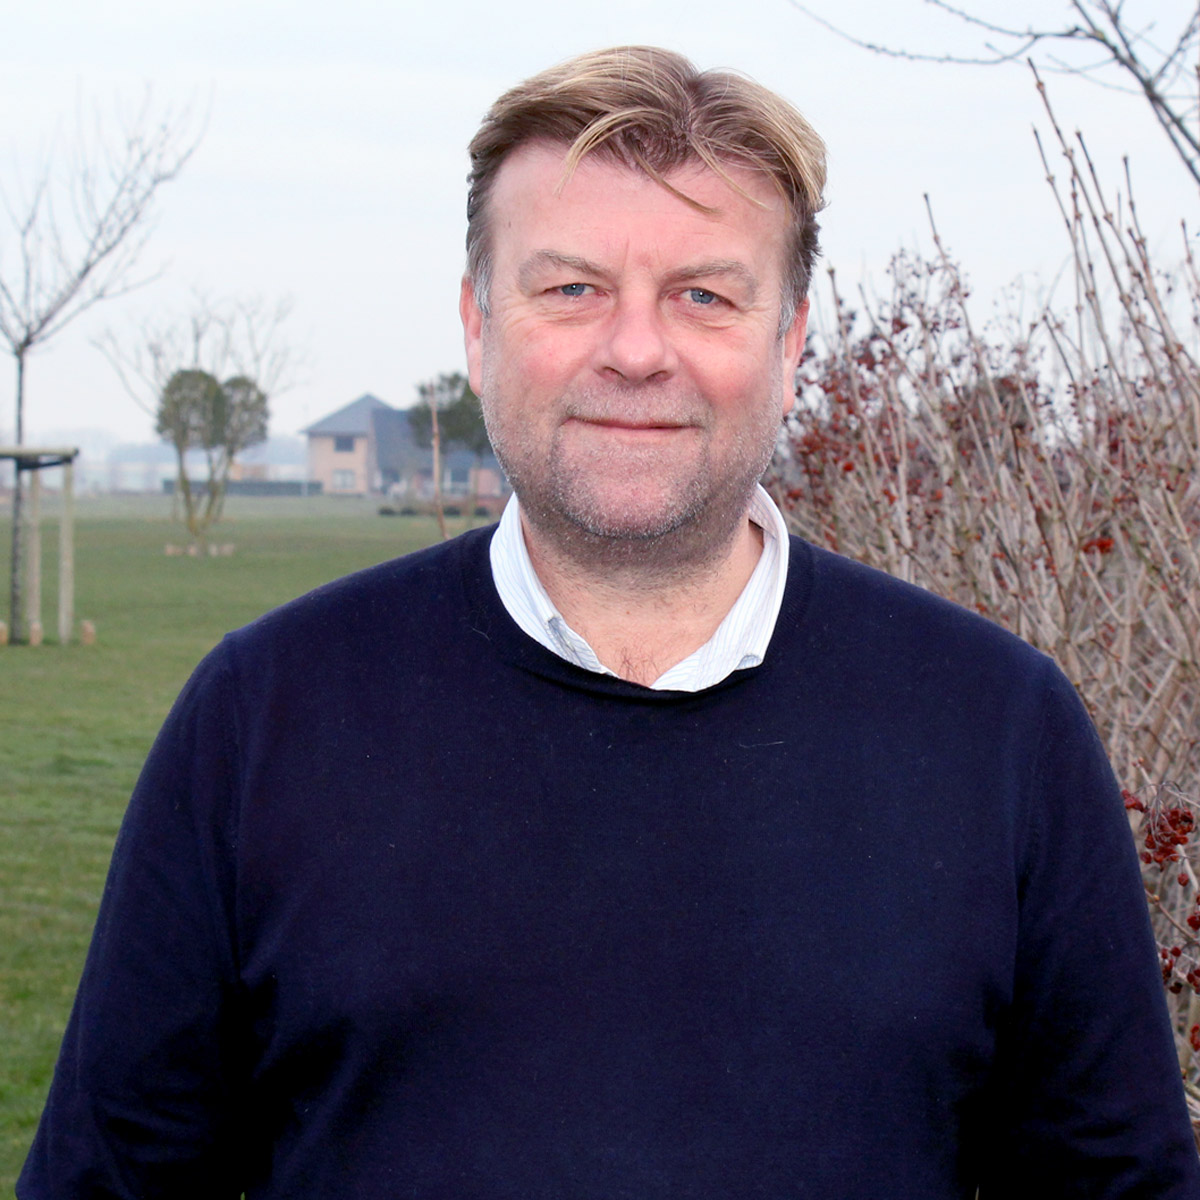 Frederik Vynck